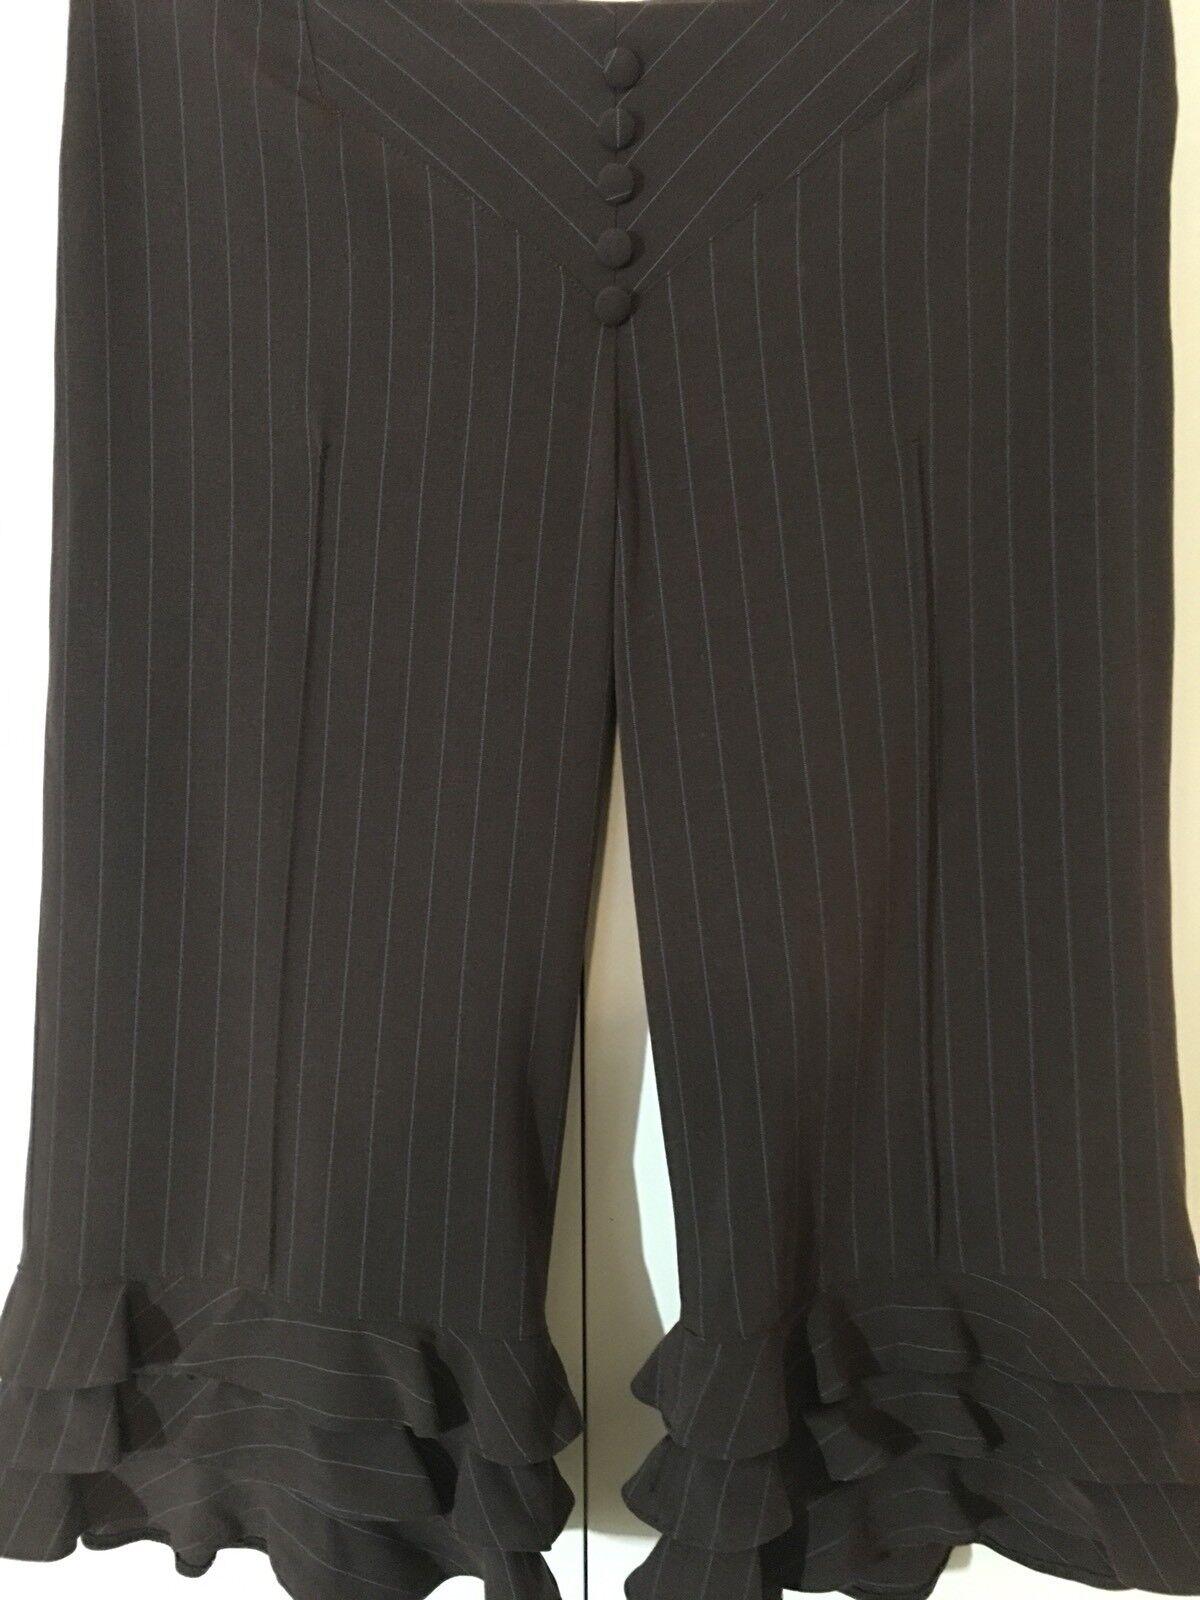 a31b0037964ba9 LOUIS VERDAD Neiman Marcus Brown Turquoise Pinstriped Ruffle Capri Pants  NEW 8